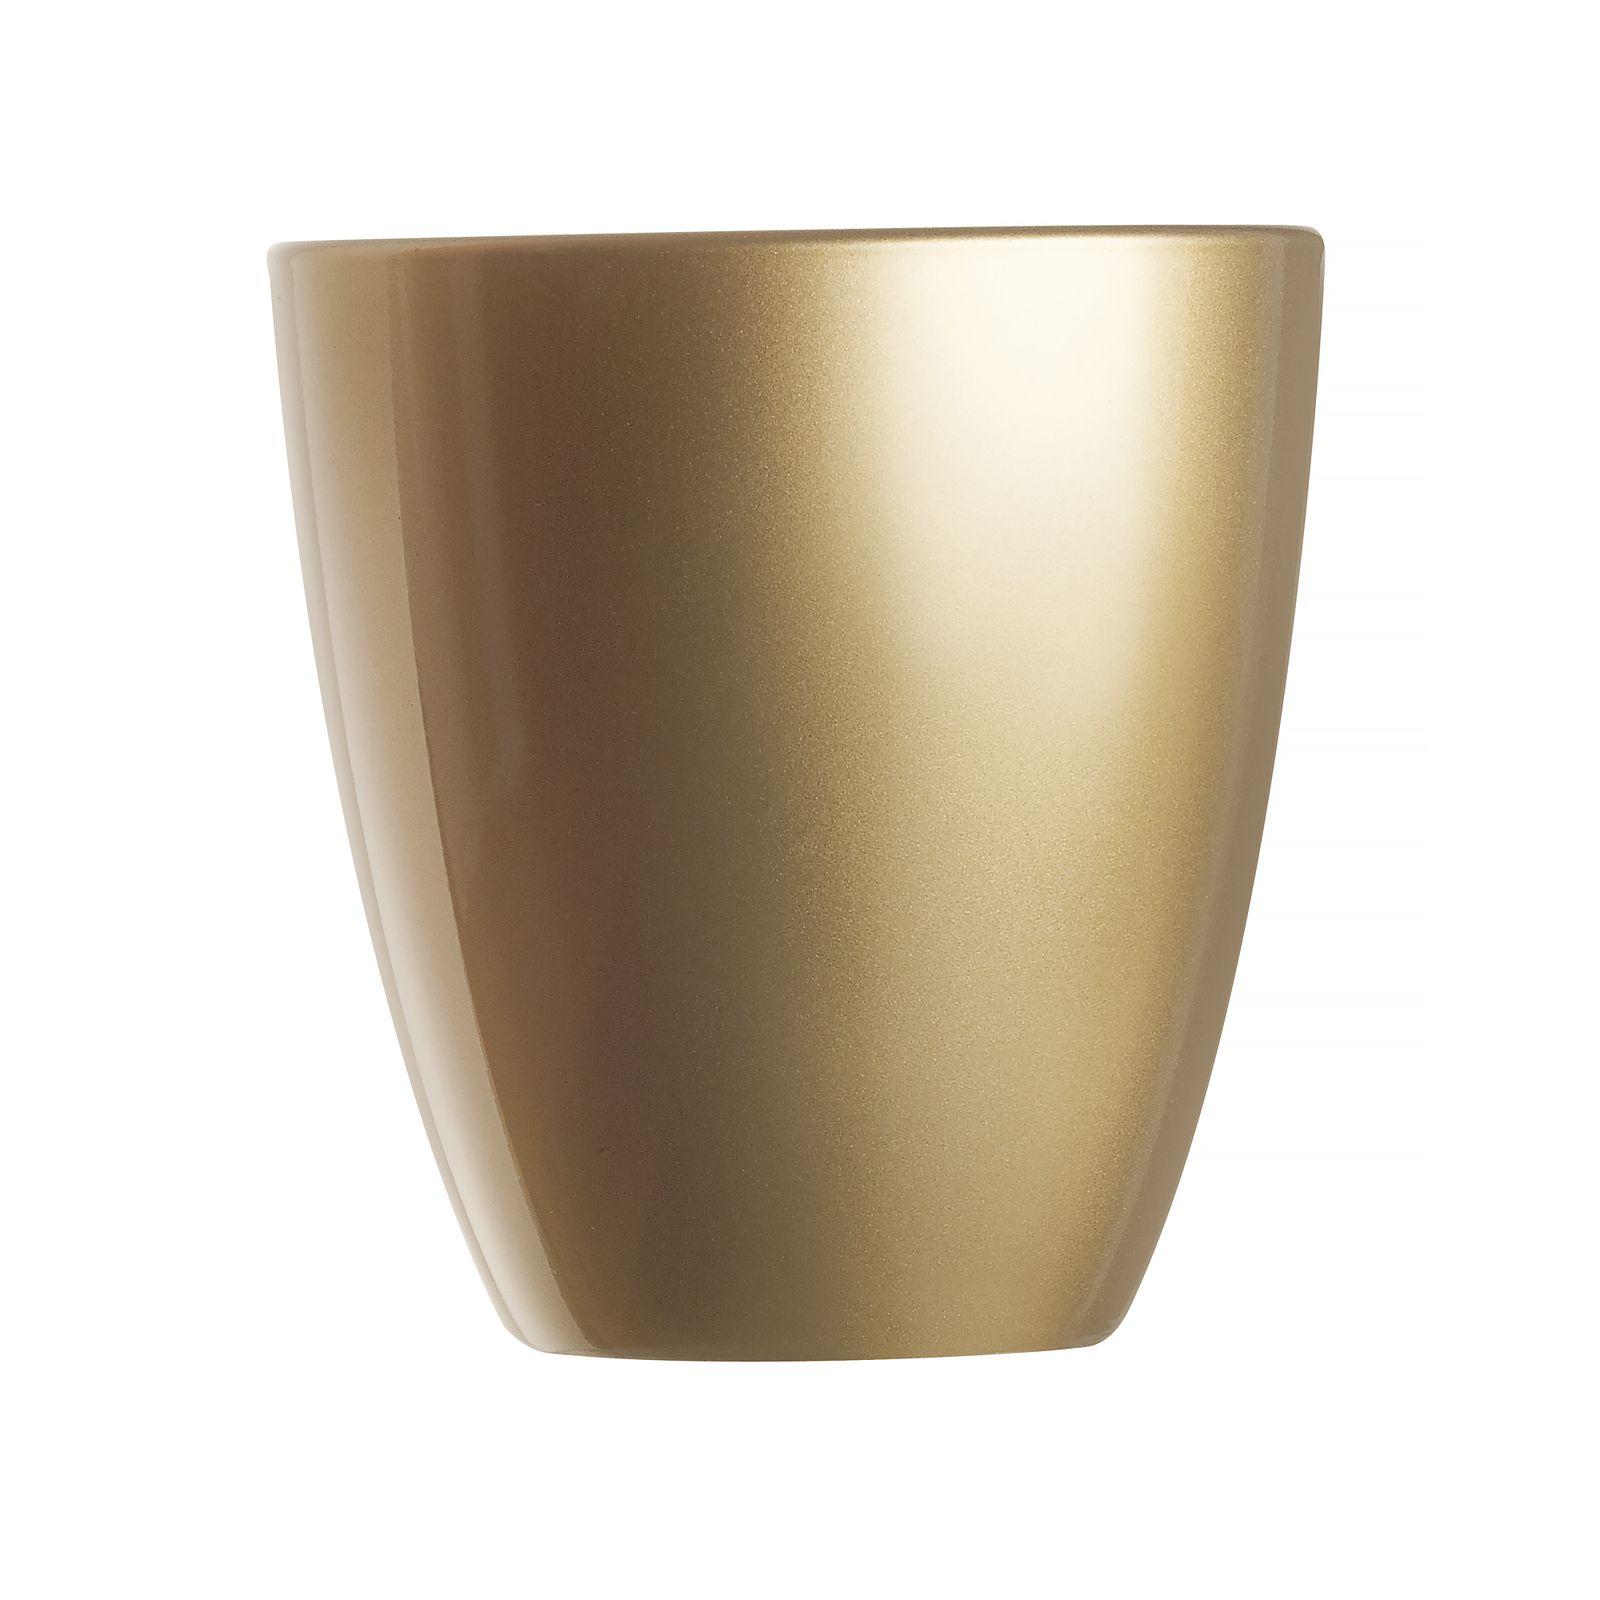 Portacandele Abacco Gold 8,5 cm LUMINARC